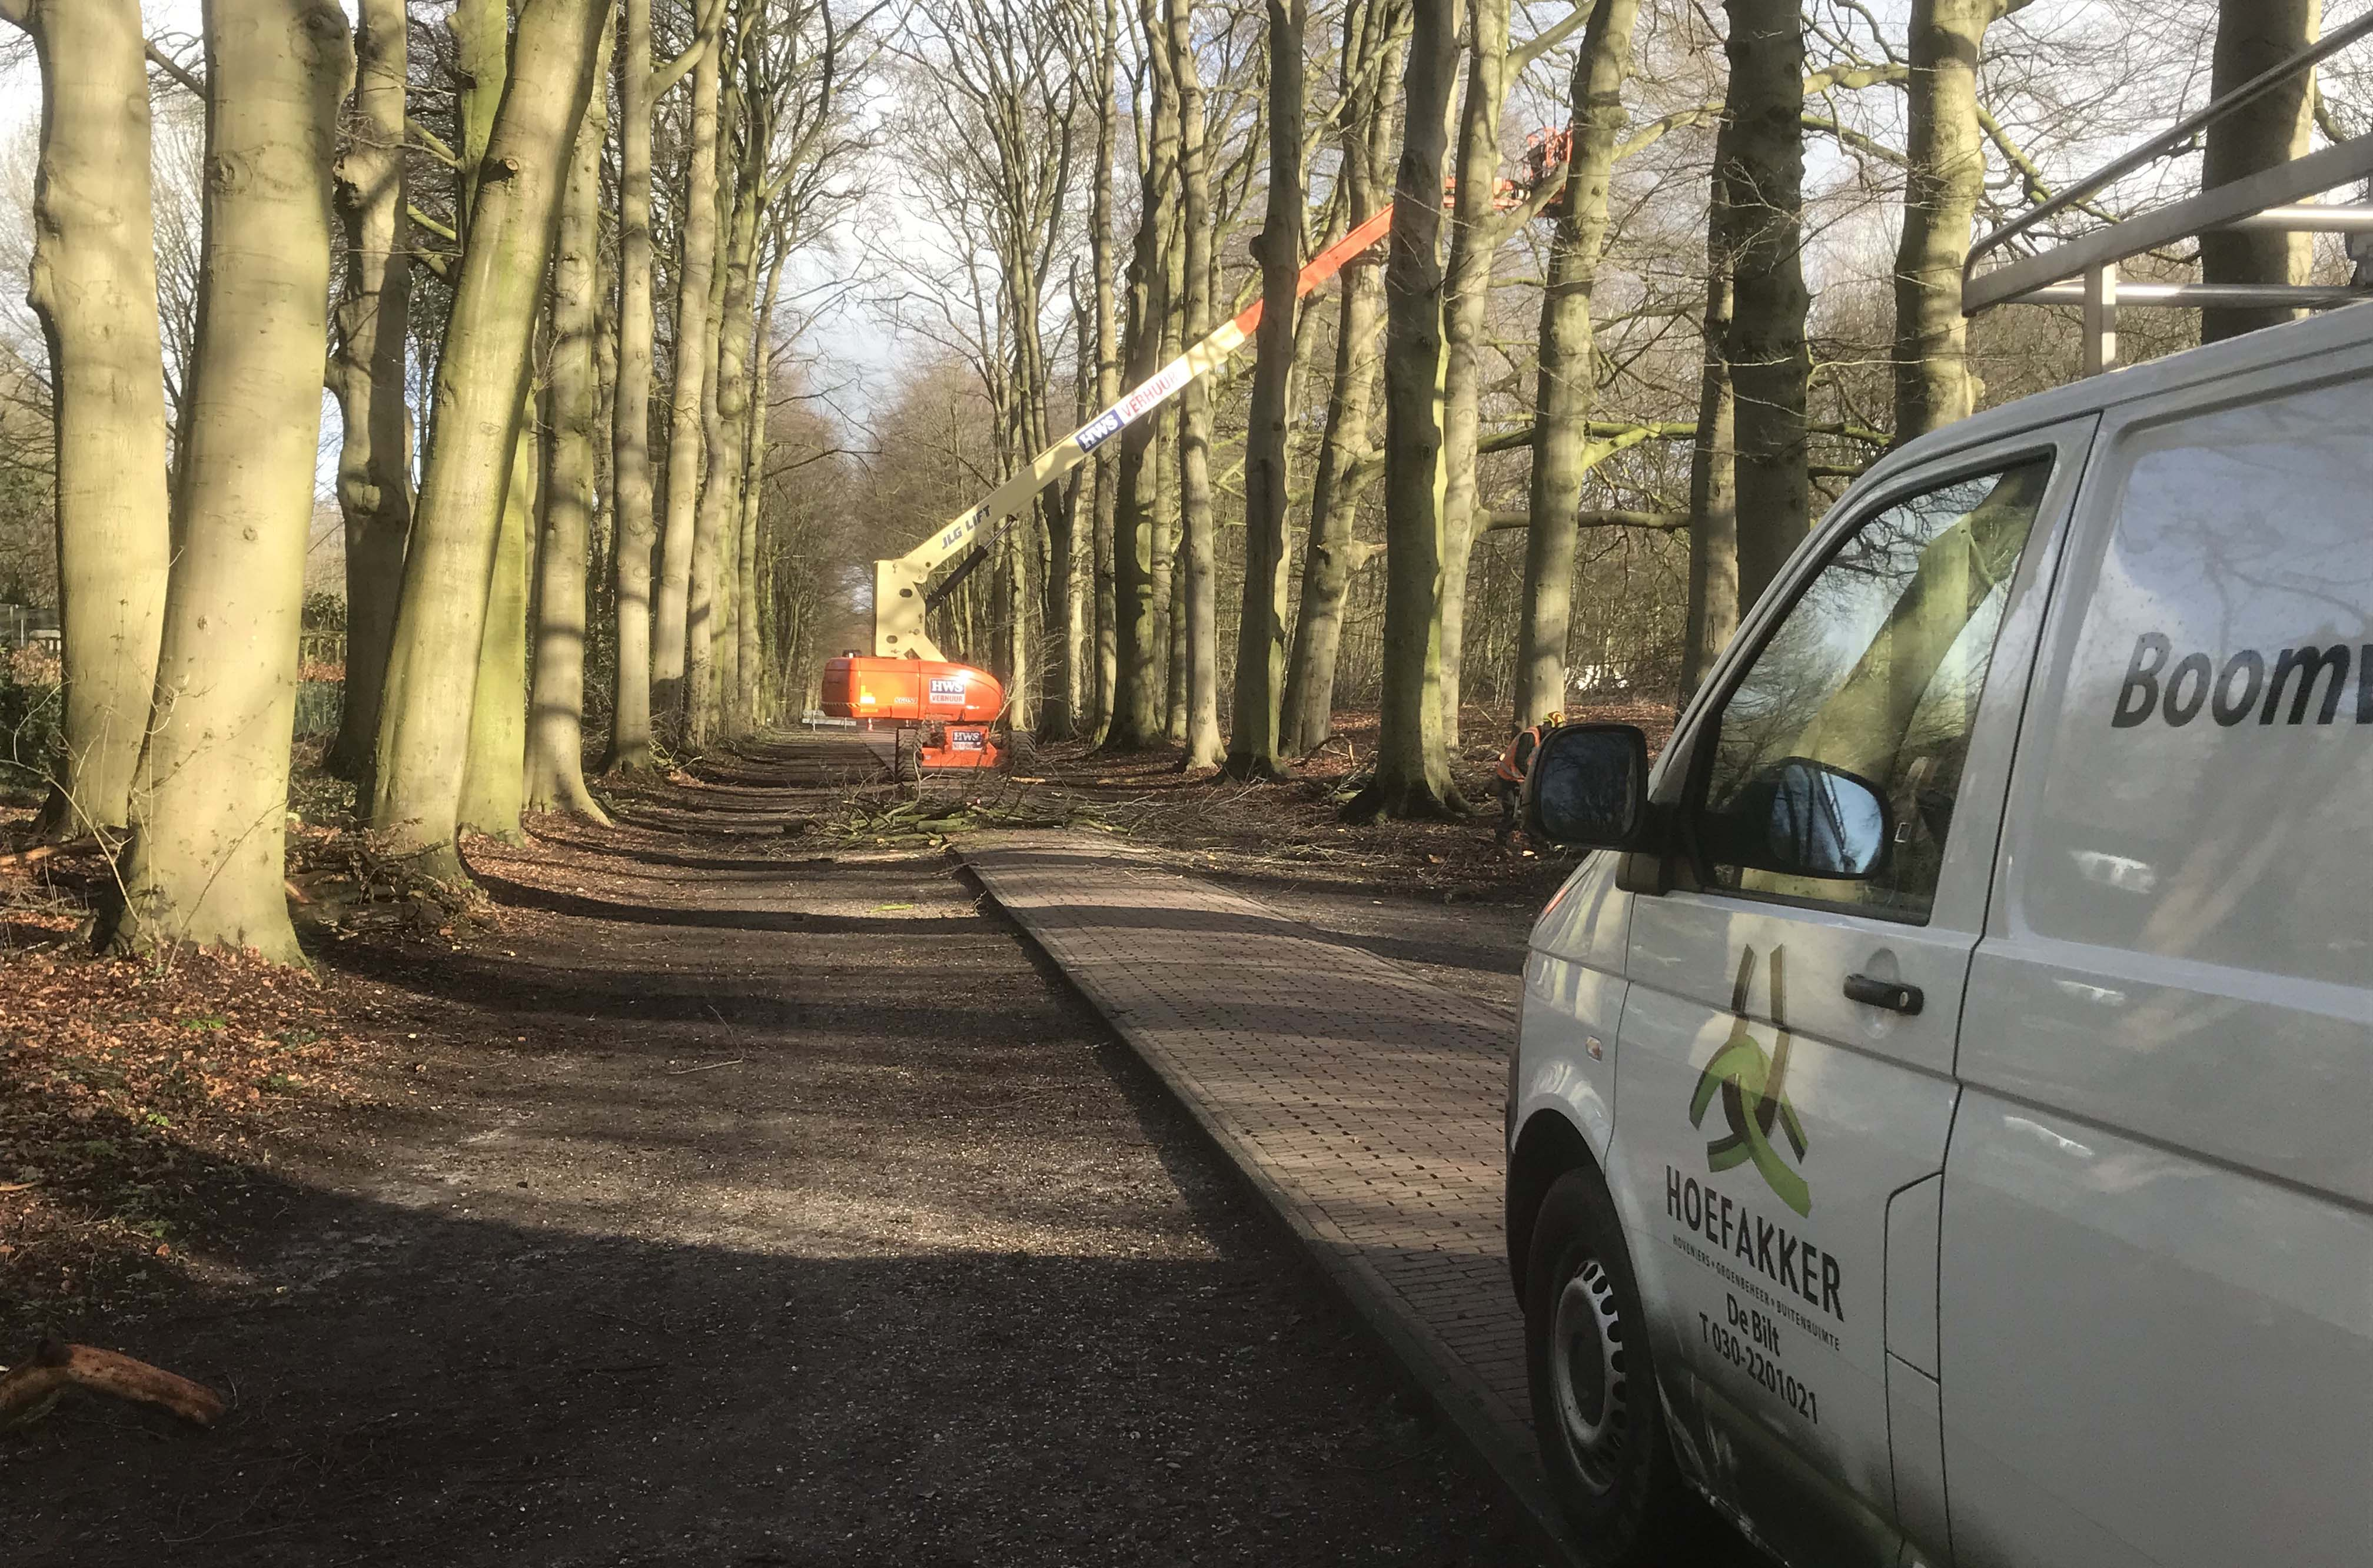 Hoefakker boomspecialisten snoeien monumentale beuken Geldersch Landschap (5m)